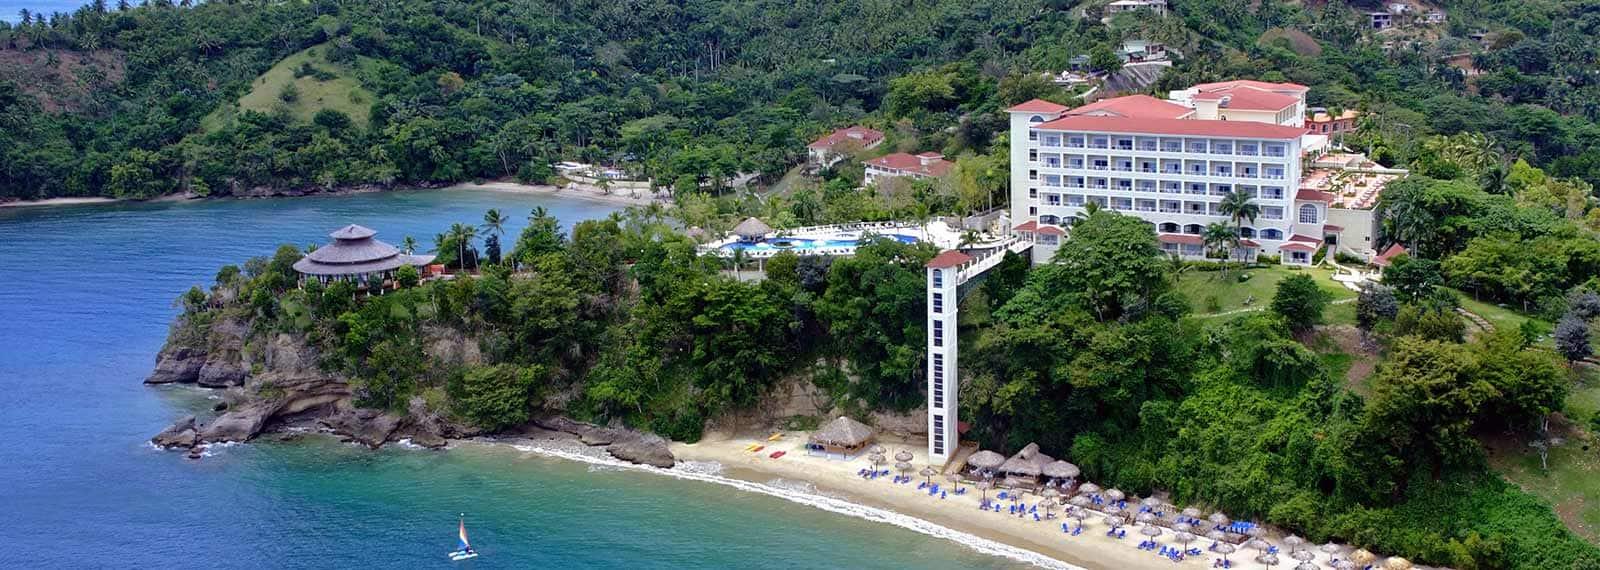 Our Resorts - Bahia Principe Hotels&Resorts